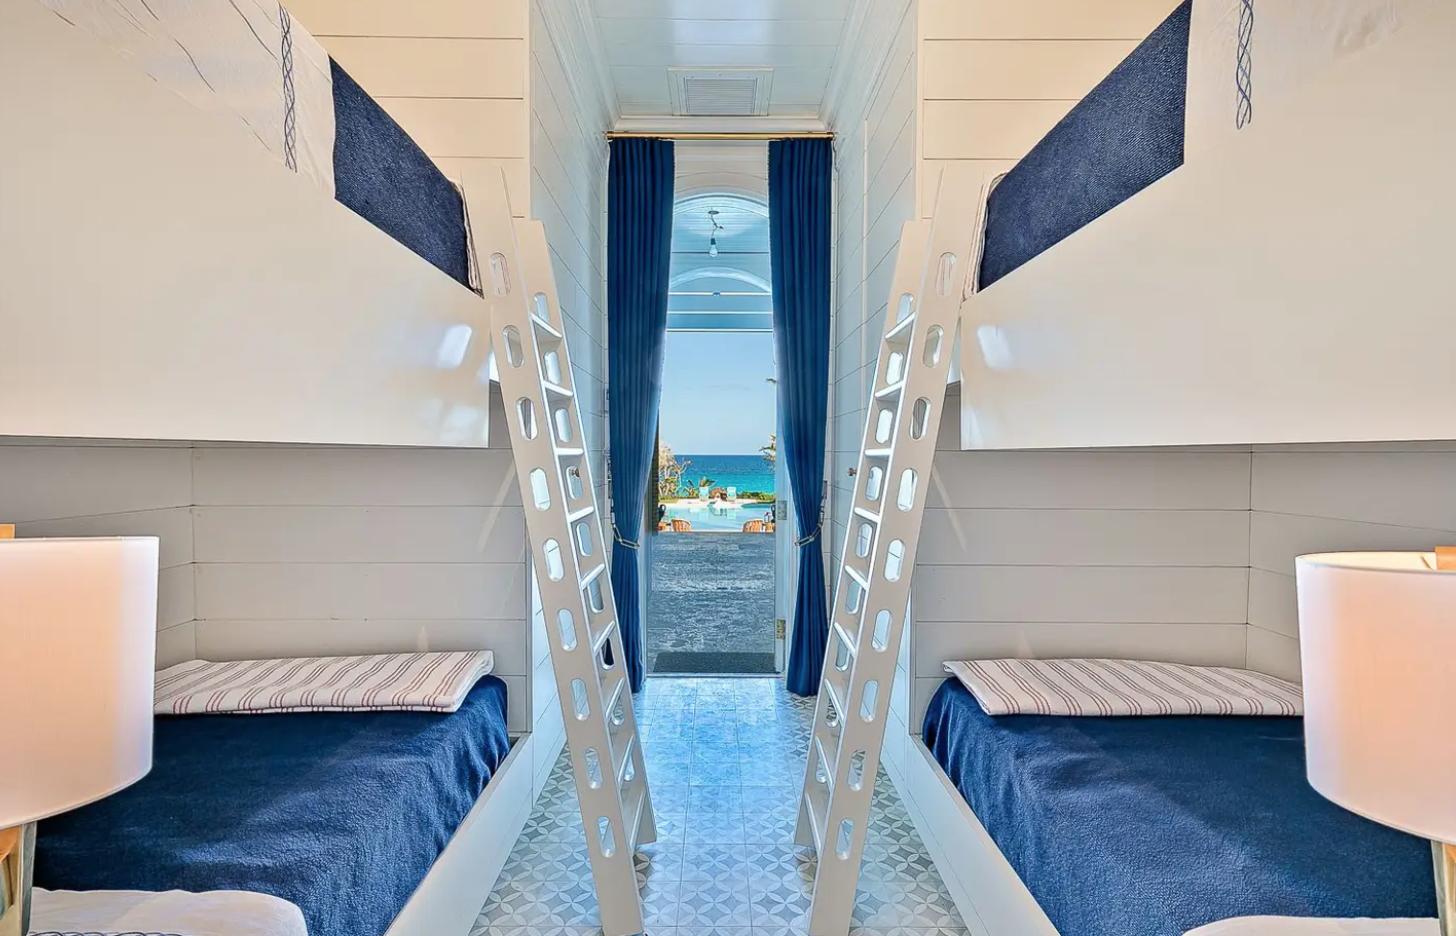 La casa en las Bahamas en que se alojó Kylie Jenner